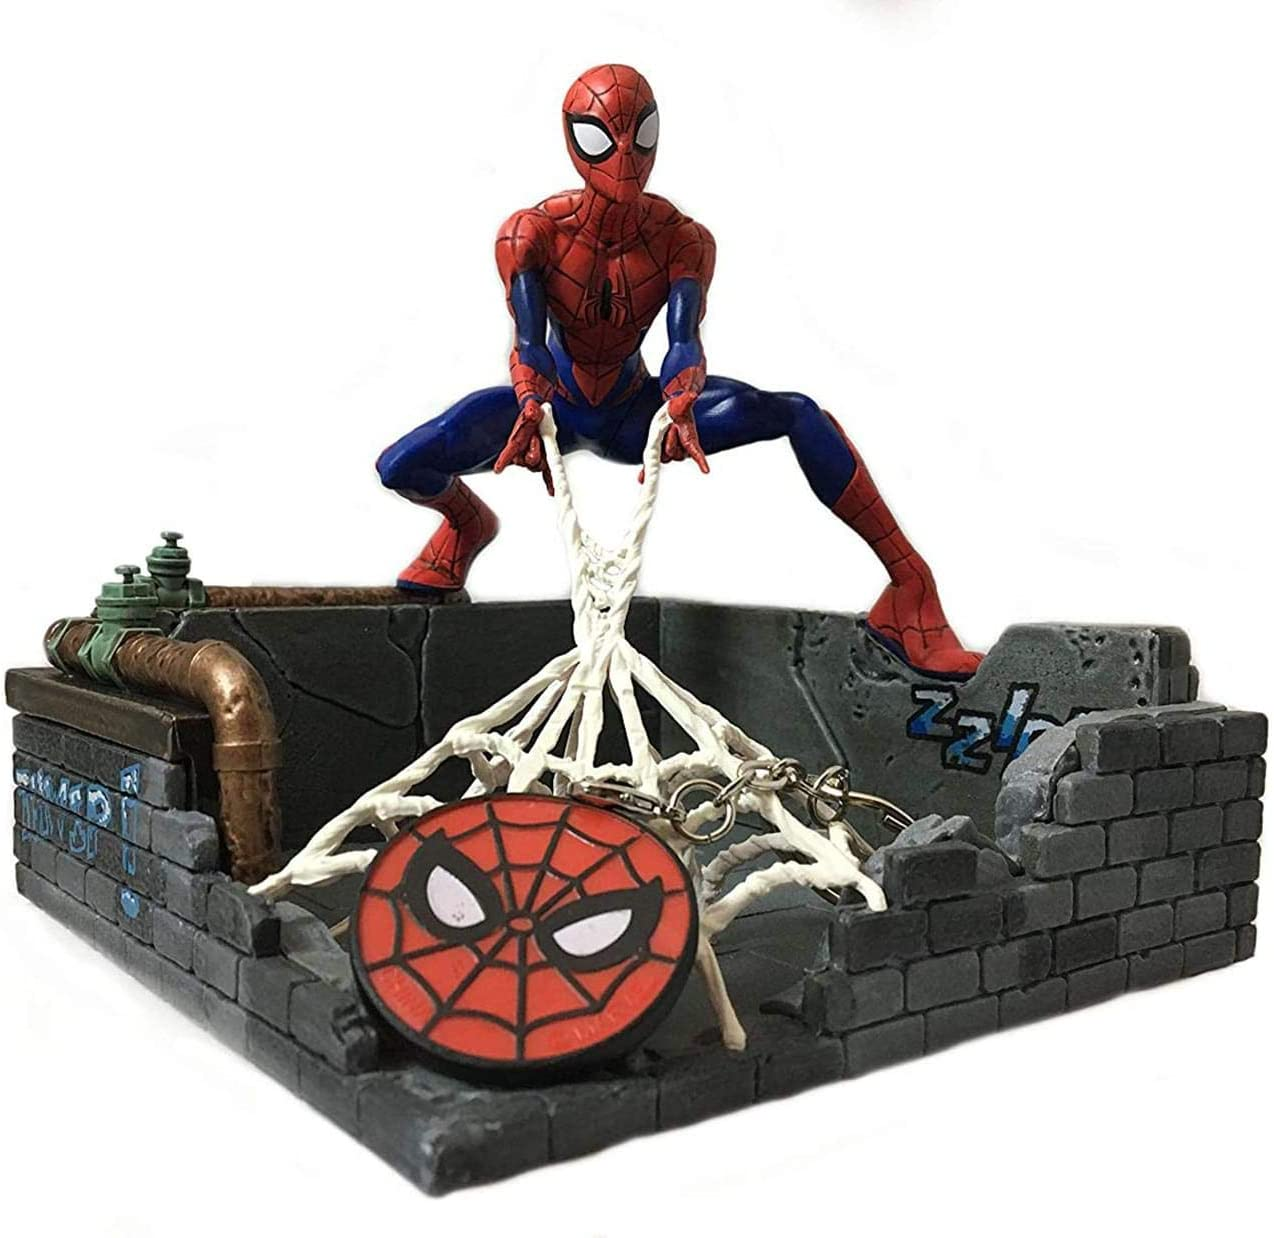 Marvel Spider-Man Finders Keypers Statue | Official Spider-Man Key Holder Figure | Holds Your Keys, Wallet, Watch & More | Measures 5.5 Inches